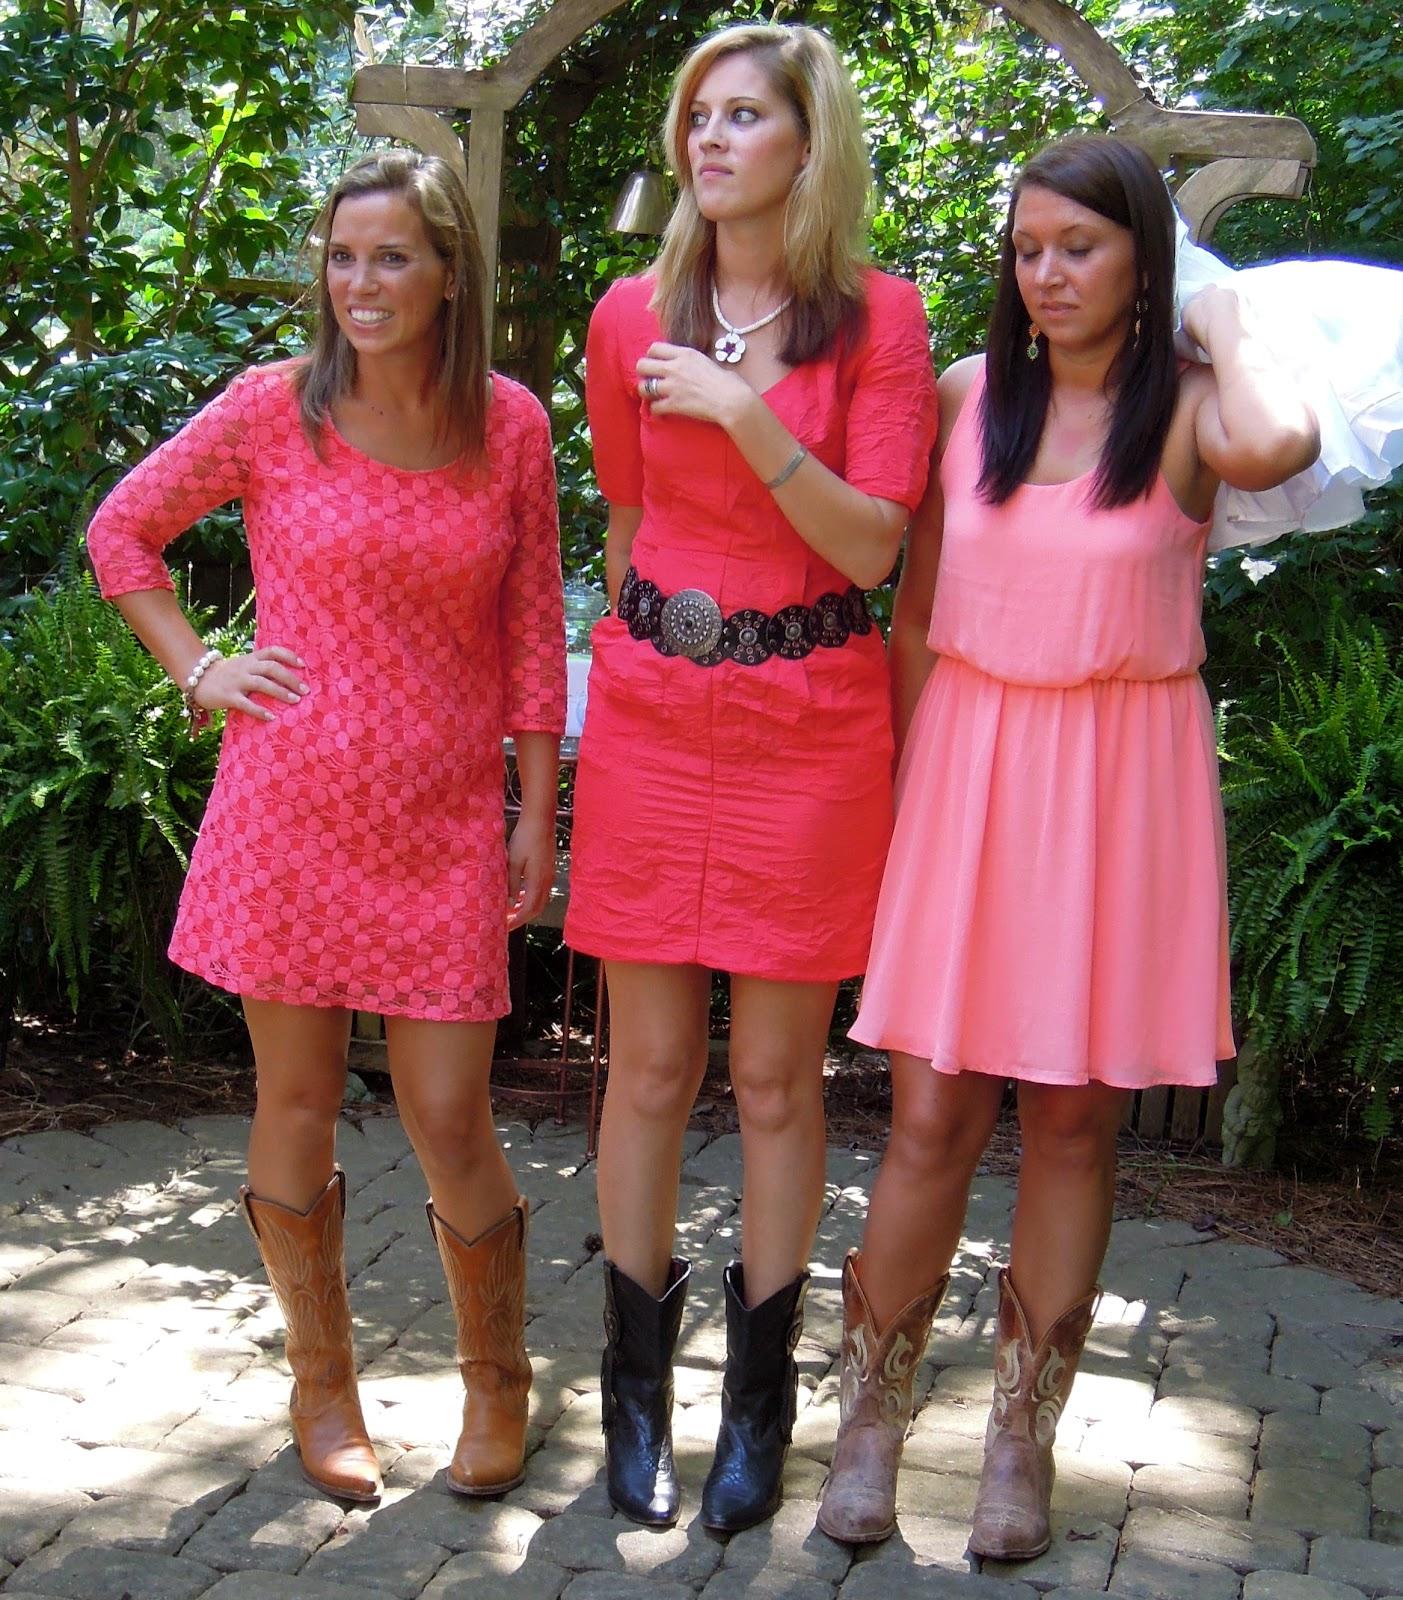 Raleigh Wedding Blog: Fun Wedding for Alexa and Chris in ...